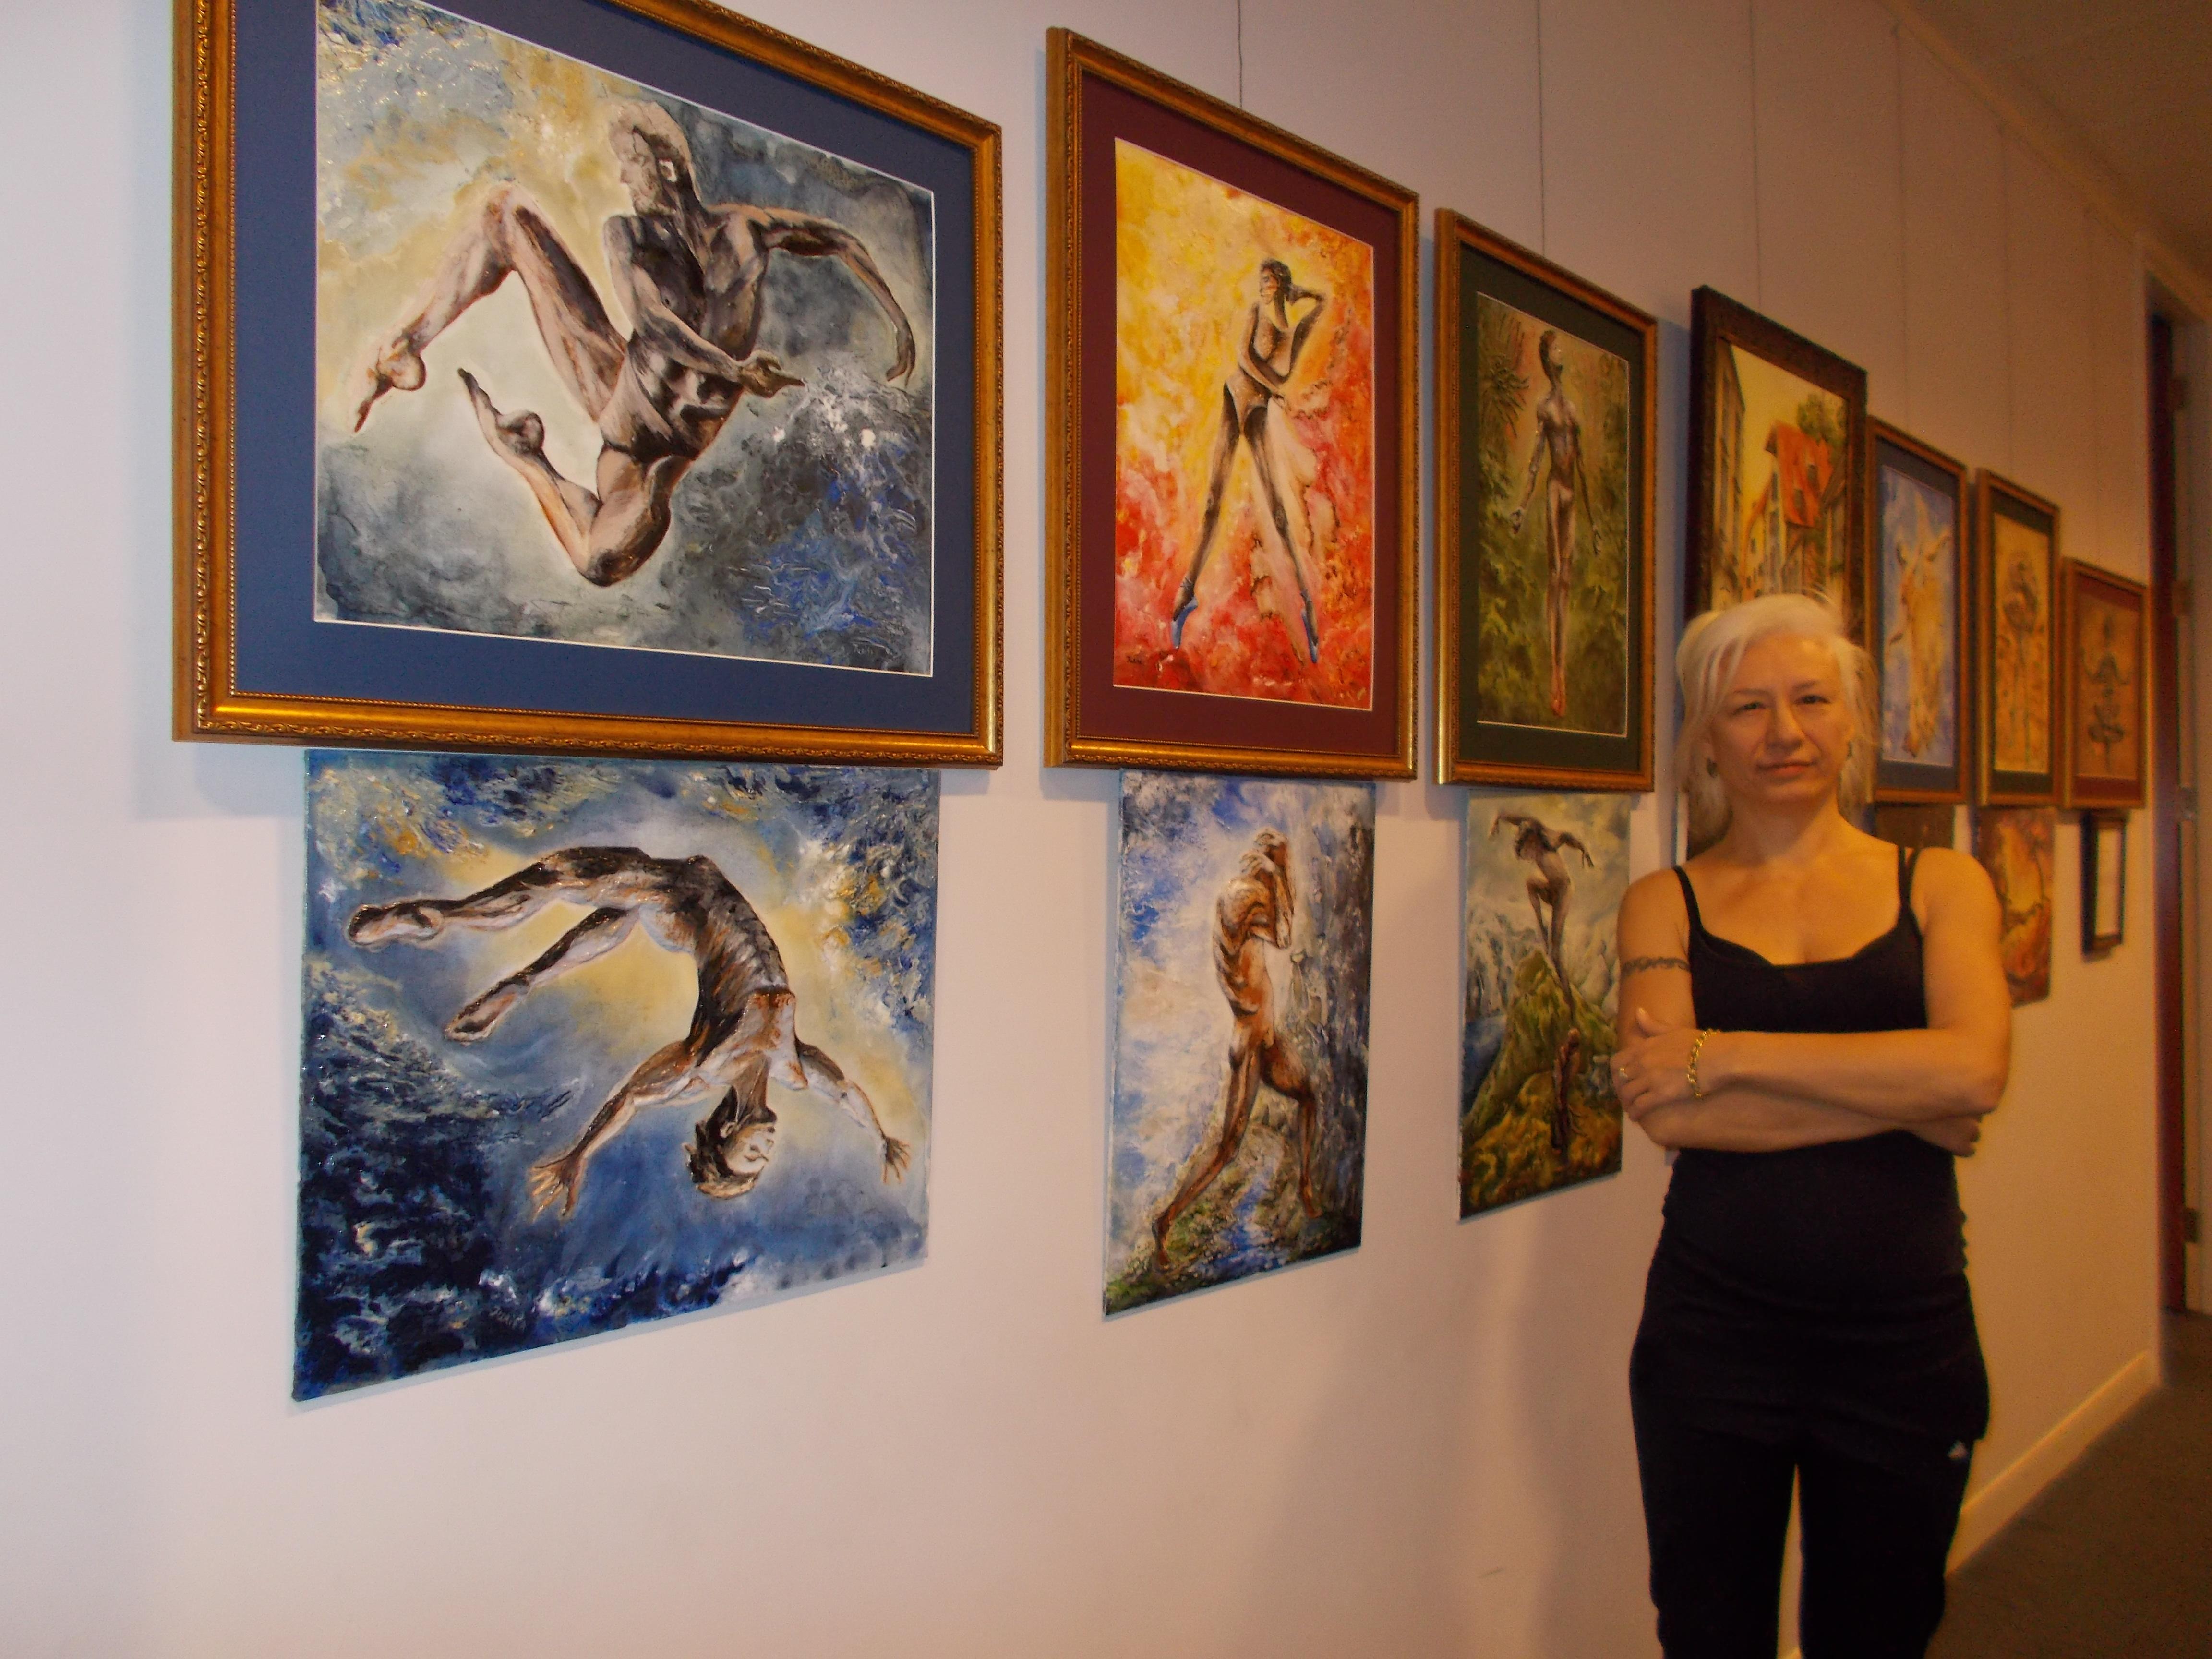 4 jurita-art and basketball- exhibition 12-22 november 2019 in Rossotrudnichestvo London (2)